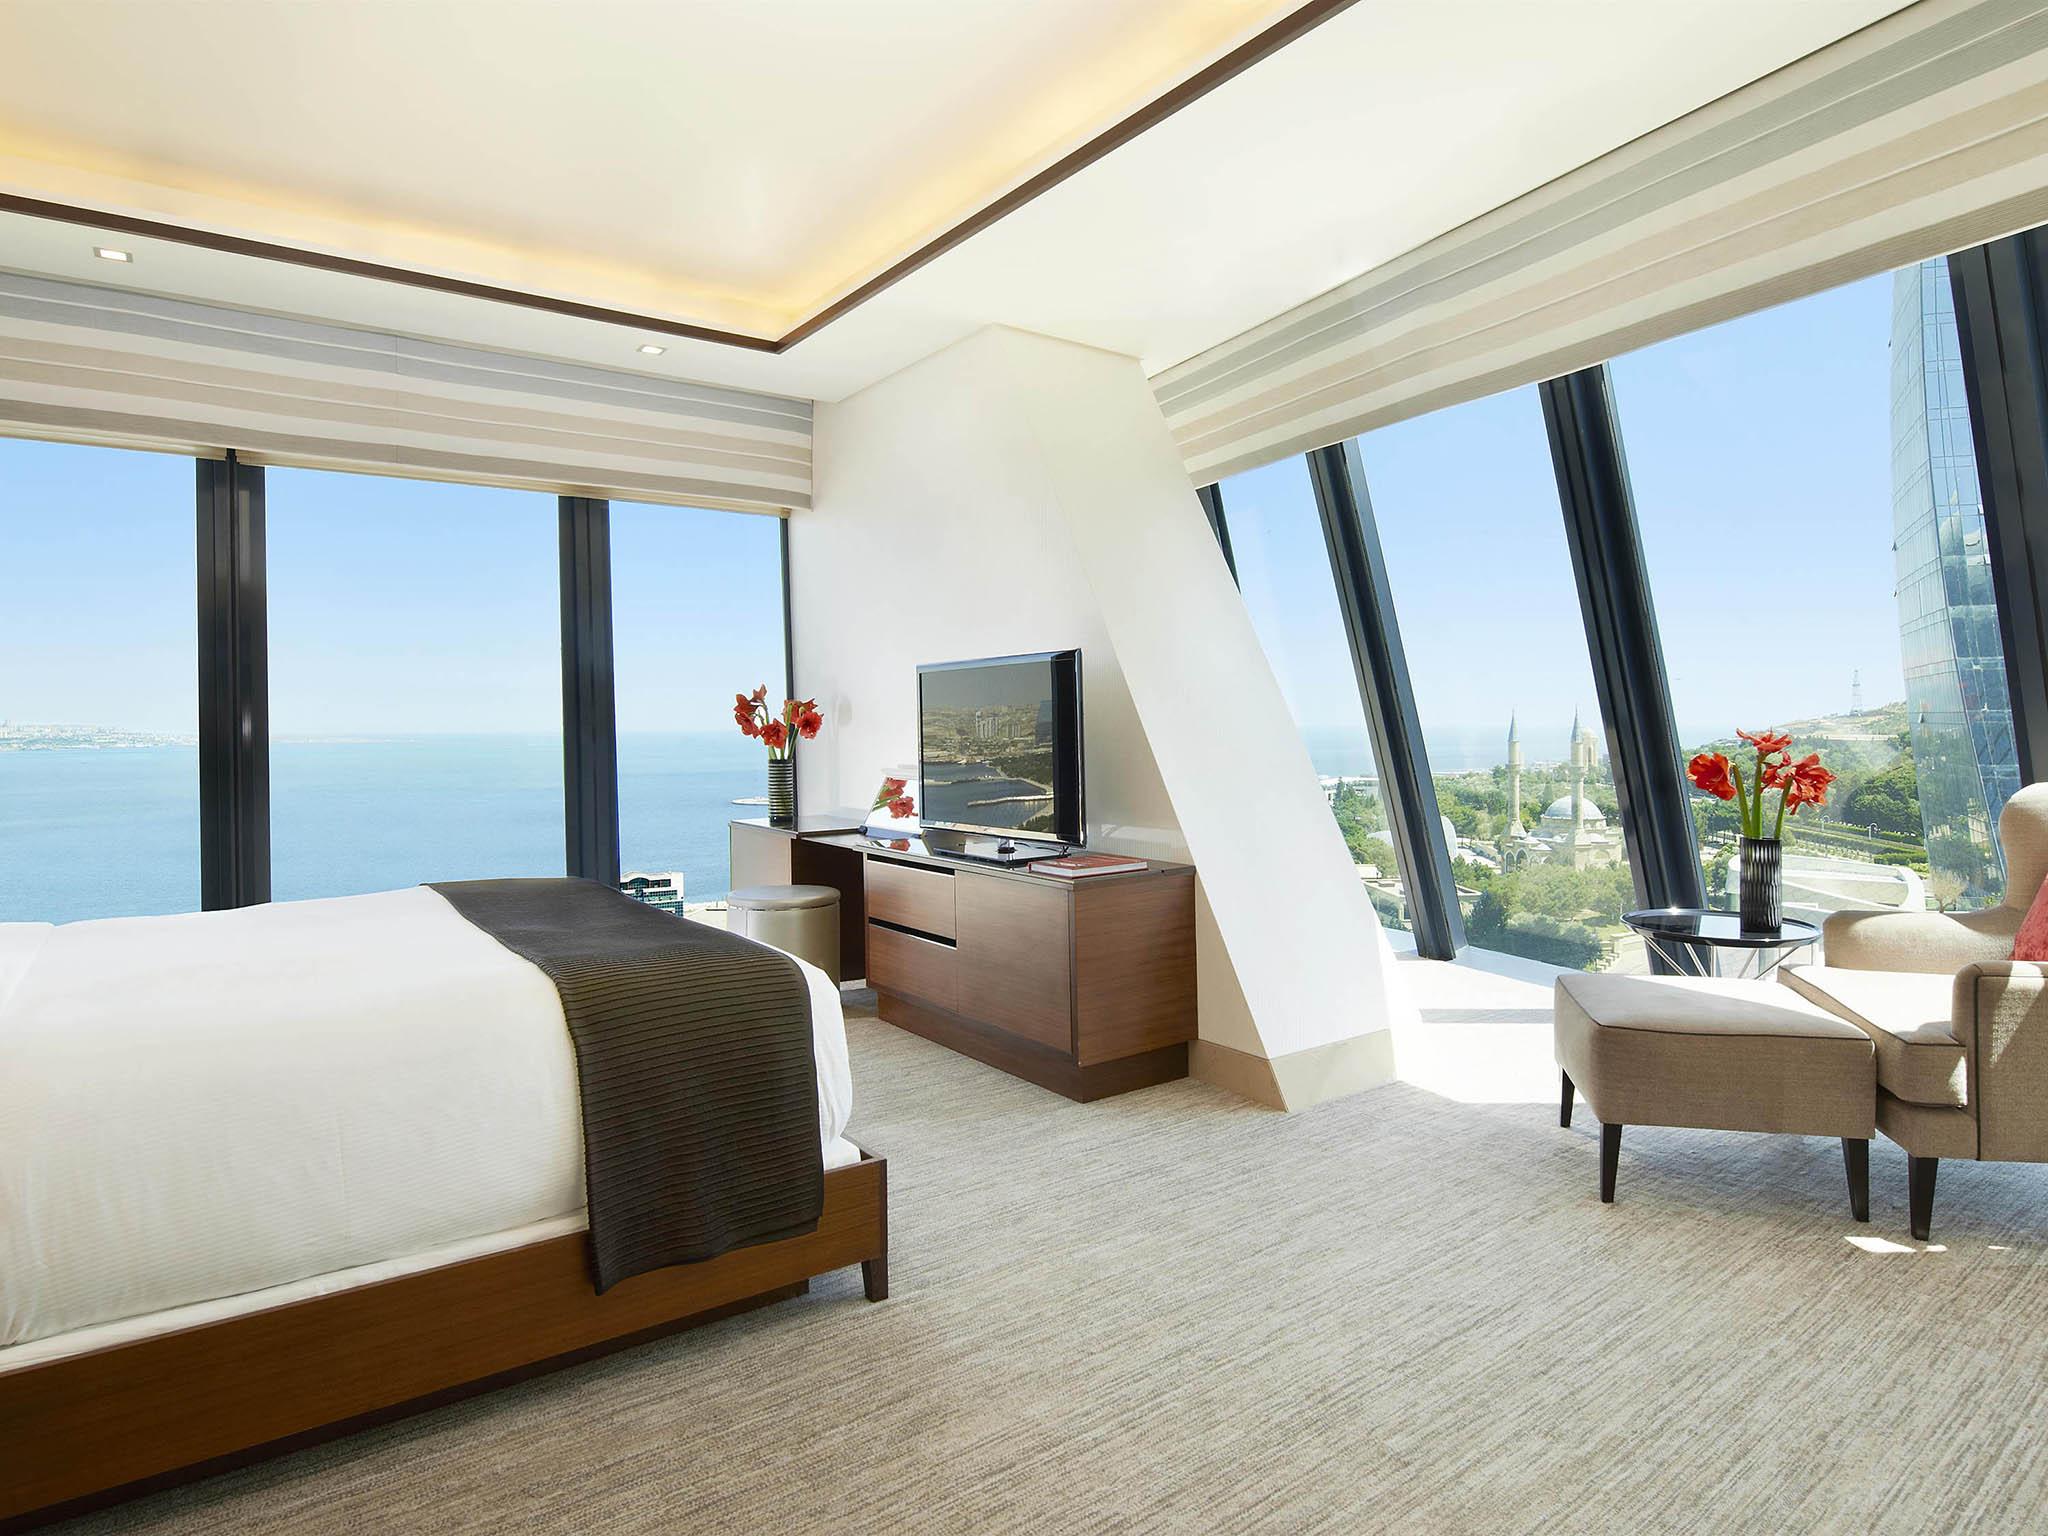 Rabatt bei Fairmont Hotels